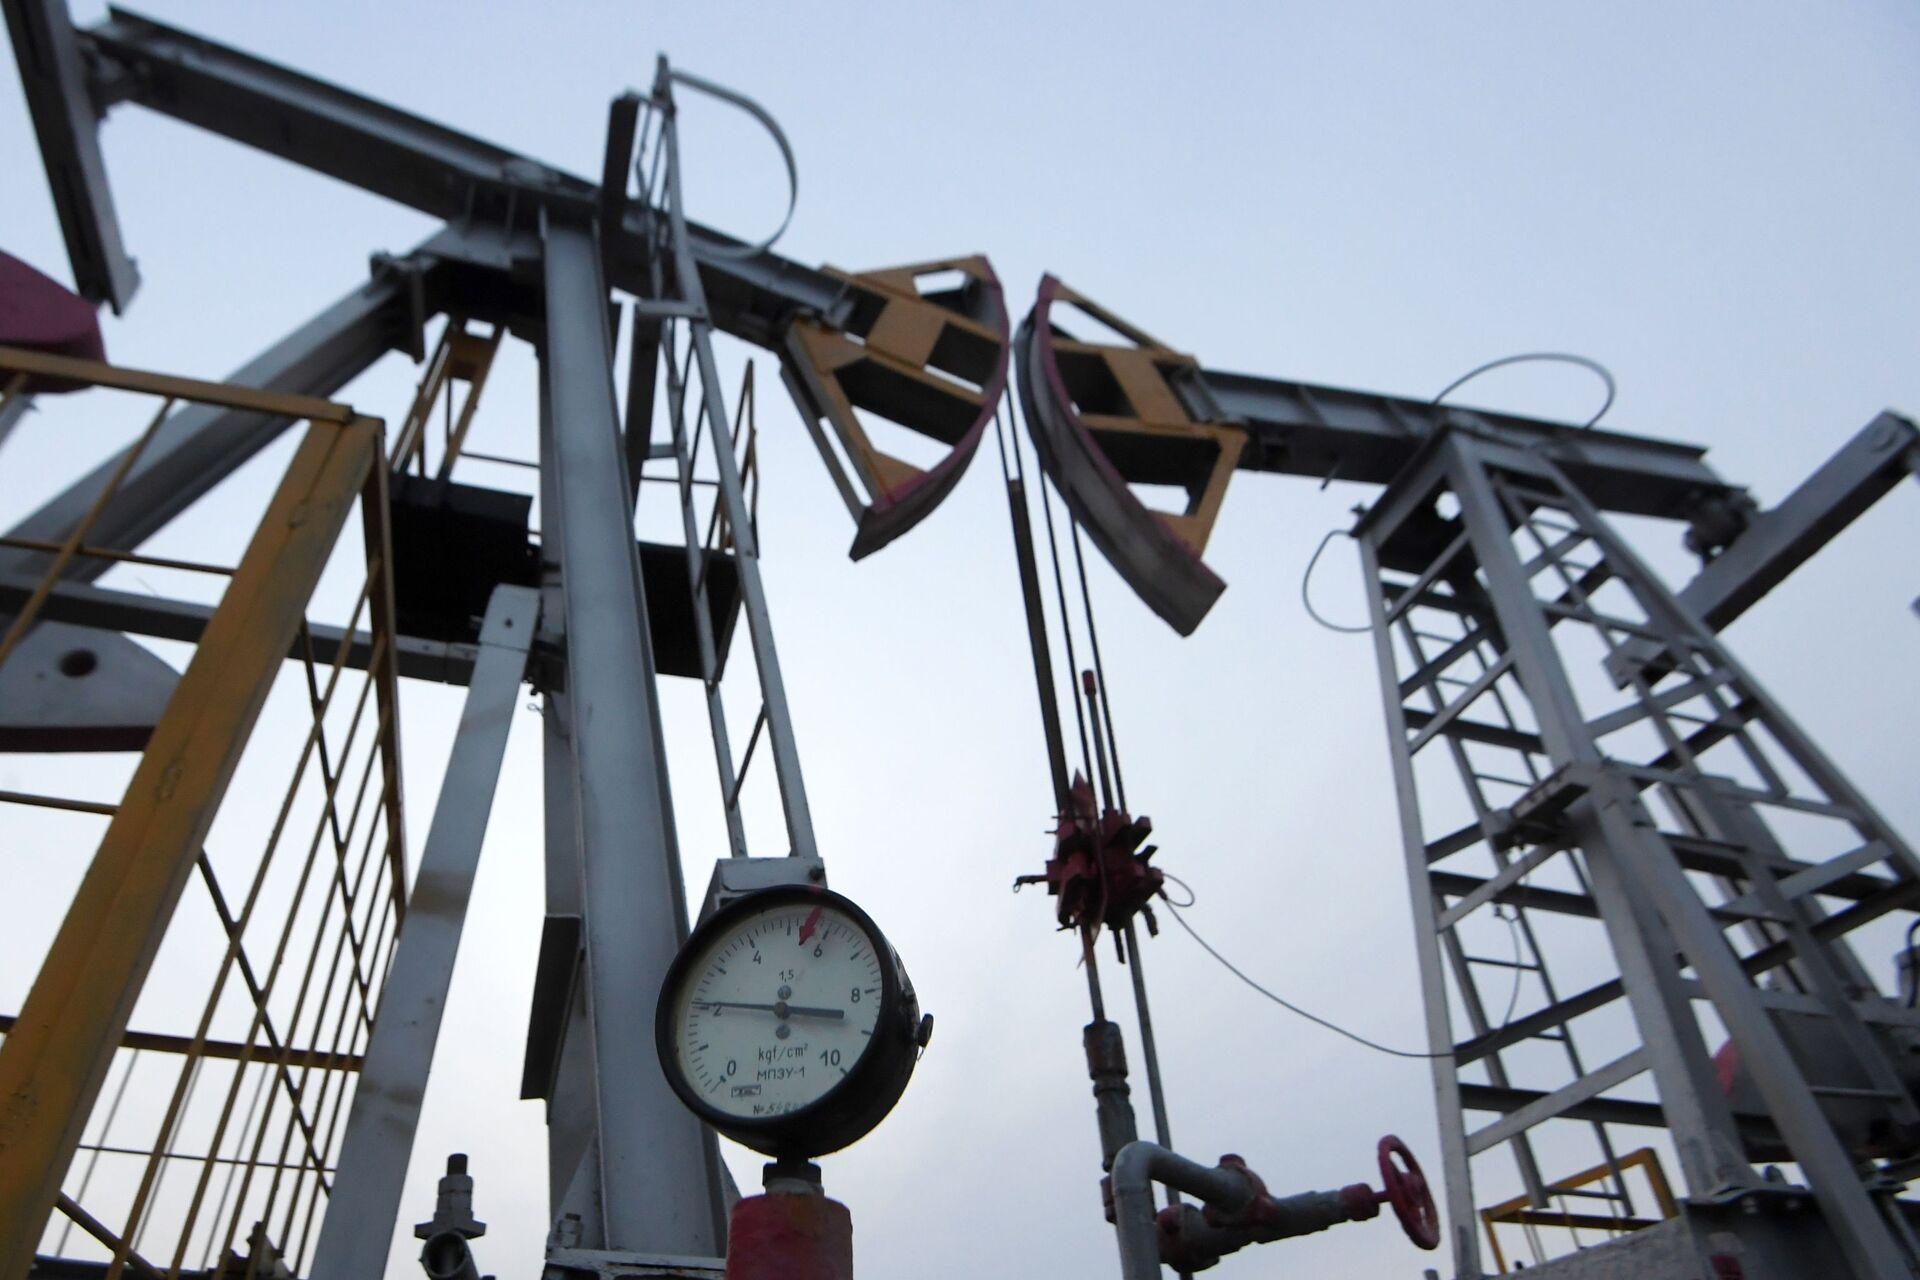 Oil pumpjack in the Republic of Tatarstan, Russia - Sputnik International, 1920, 24.09.2021